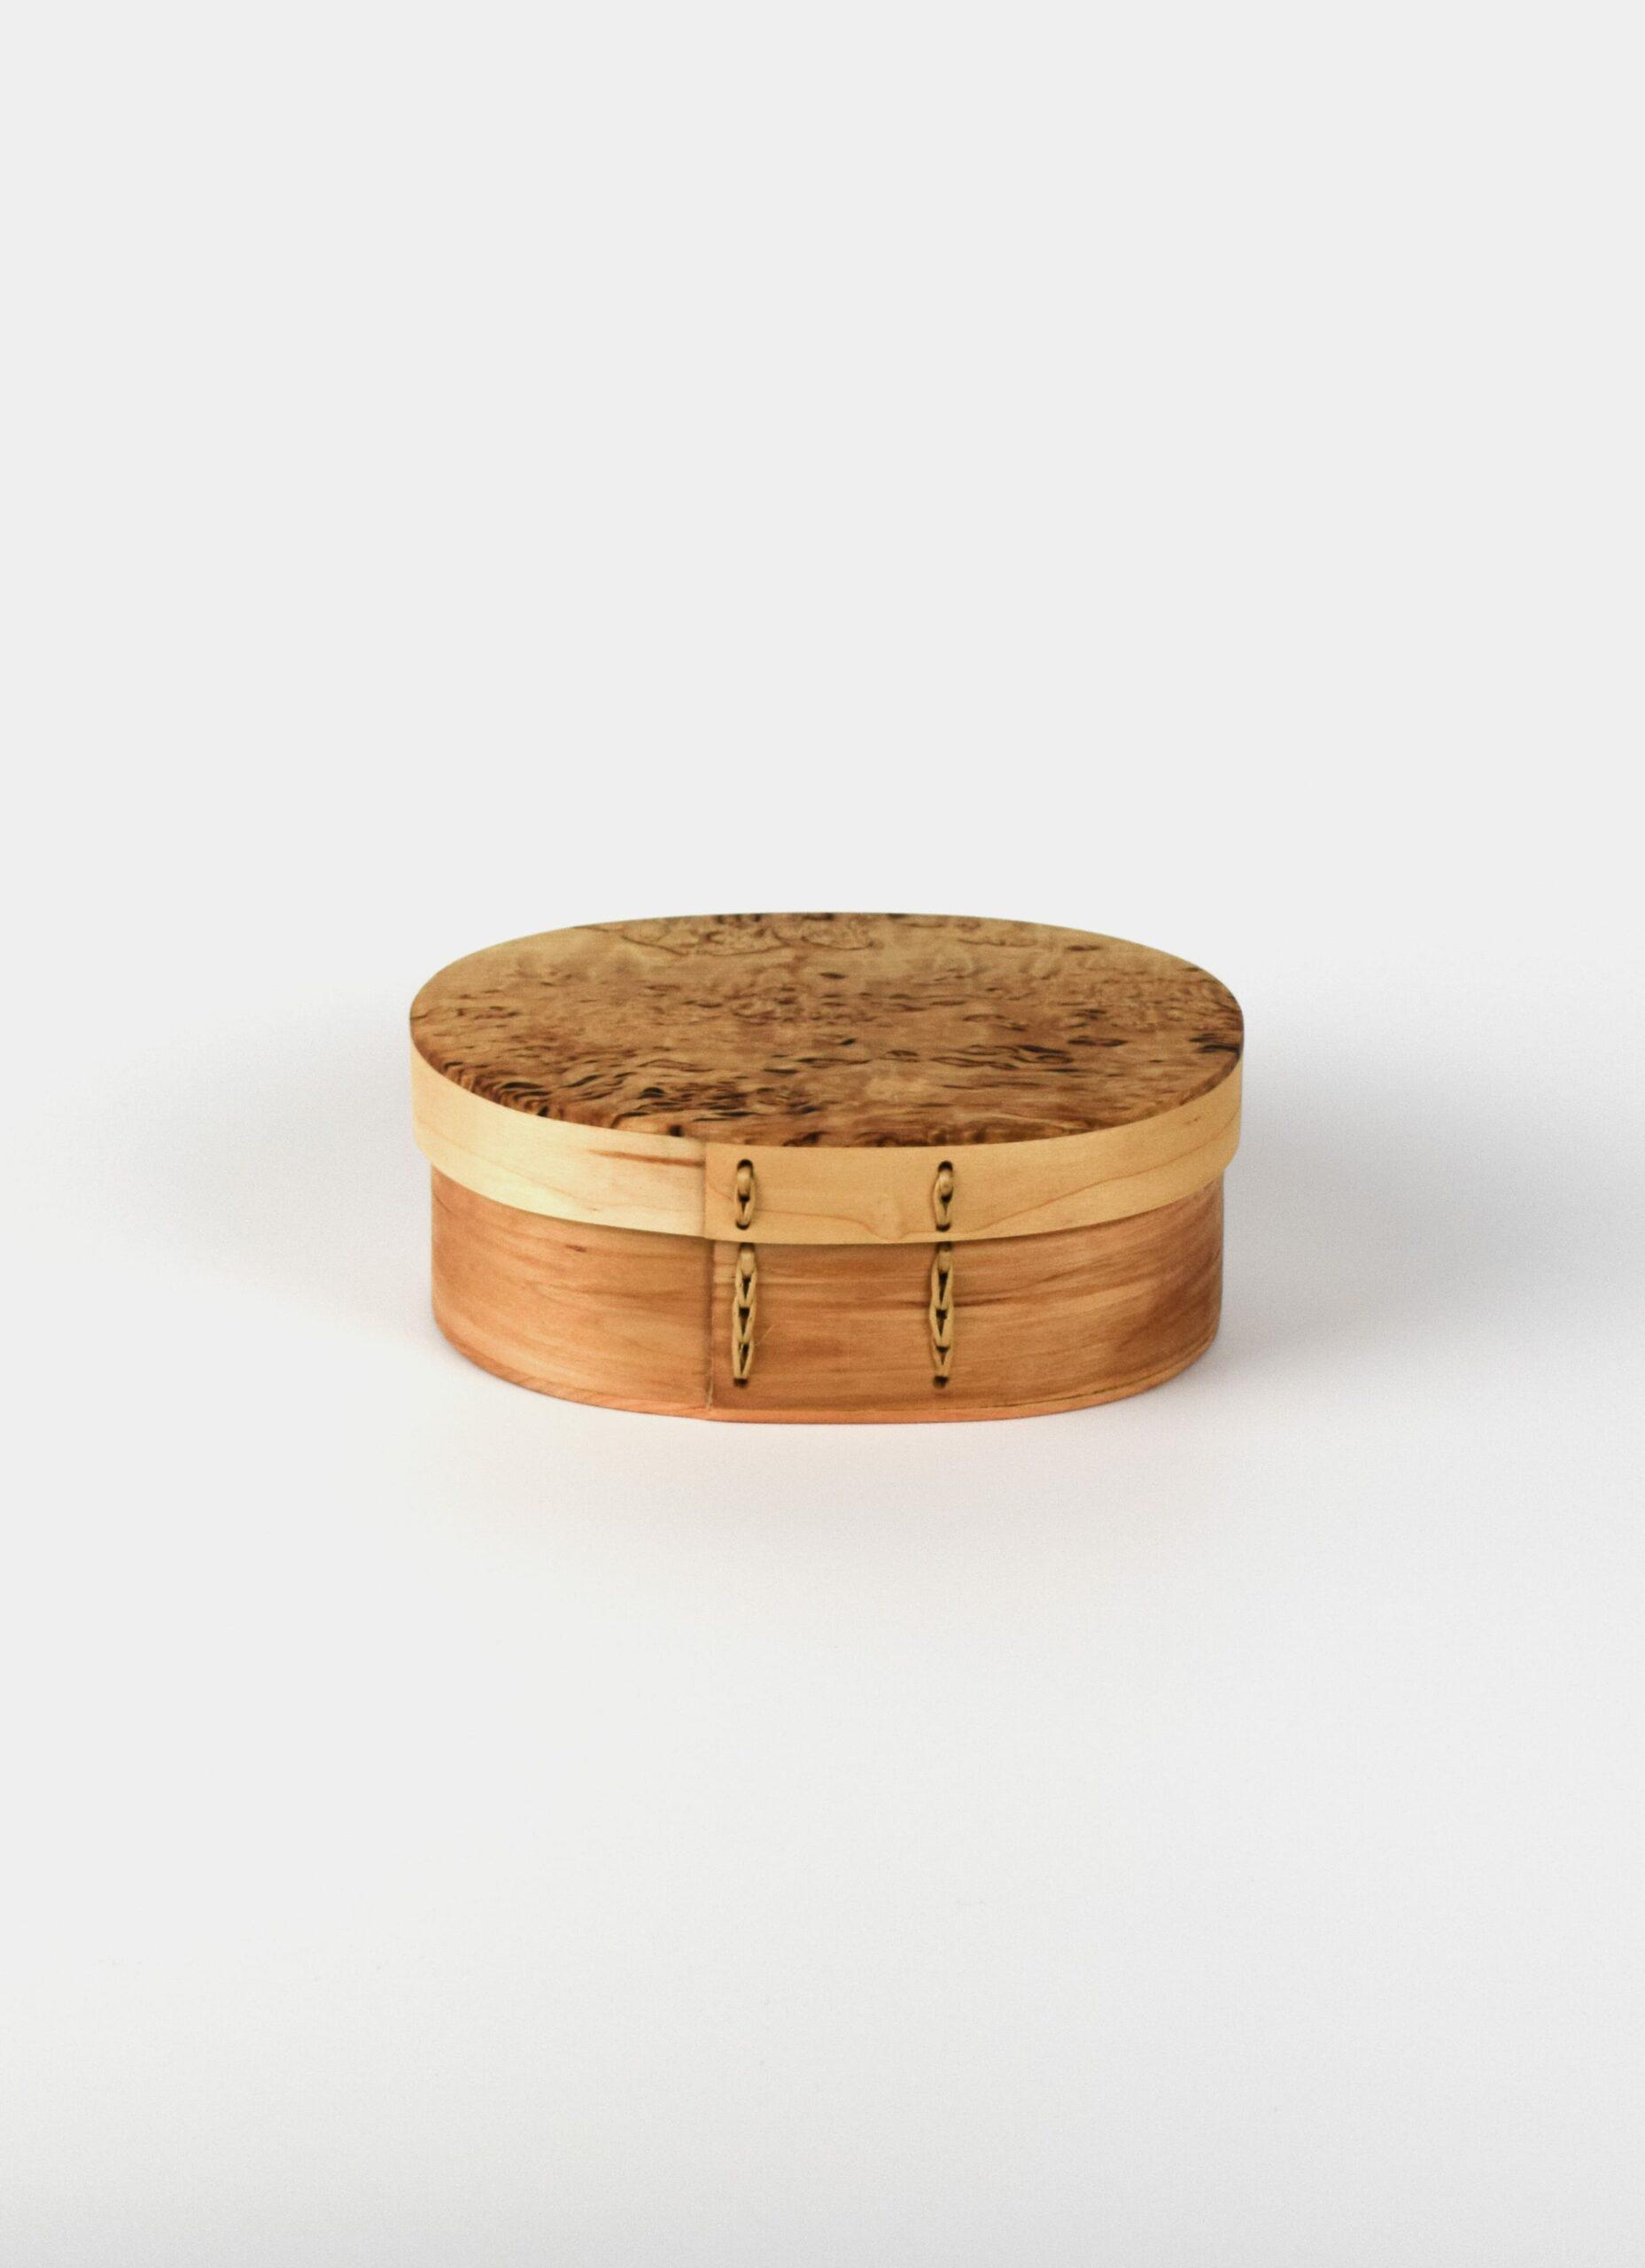 Ljungars Bo-Ake - Handmade - Birch Shaker Box